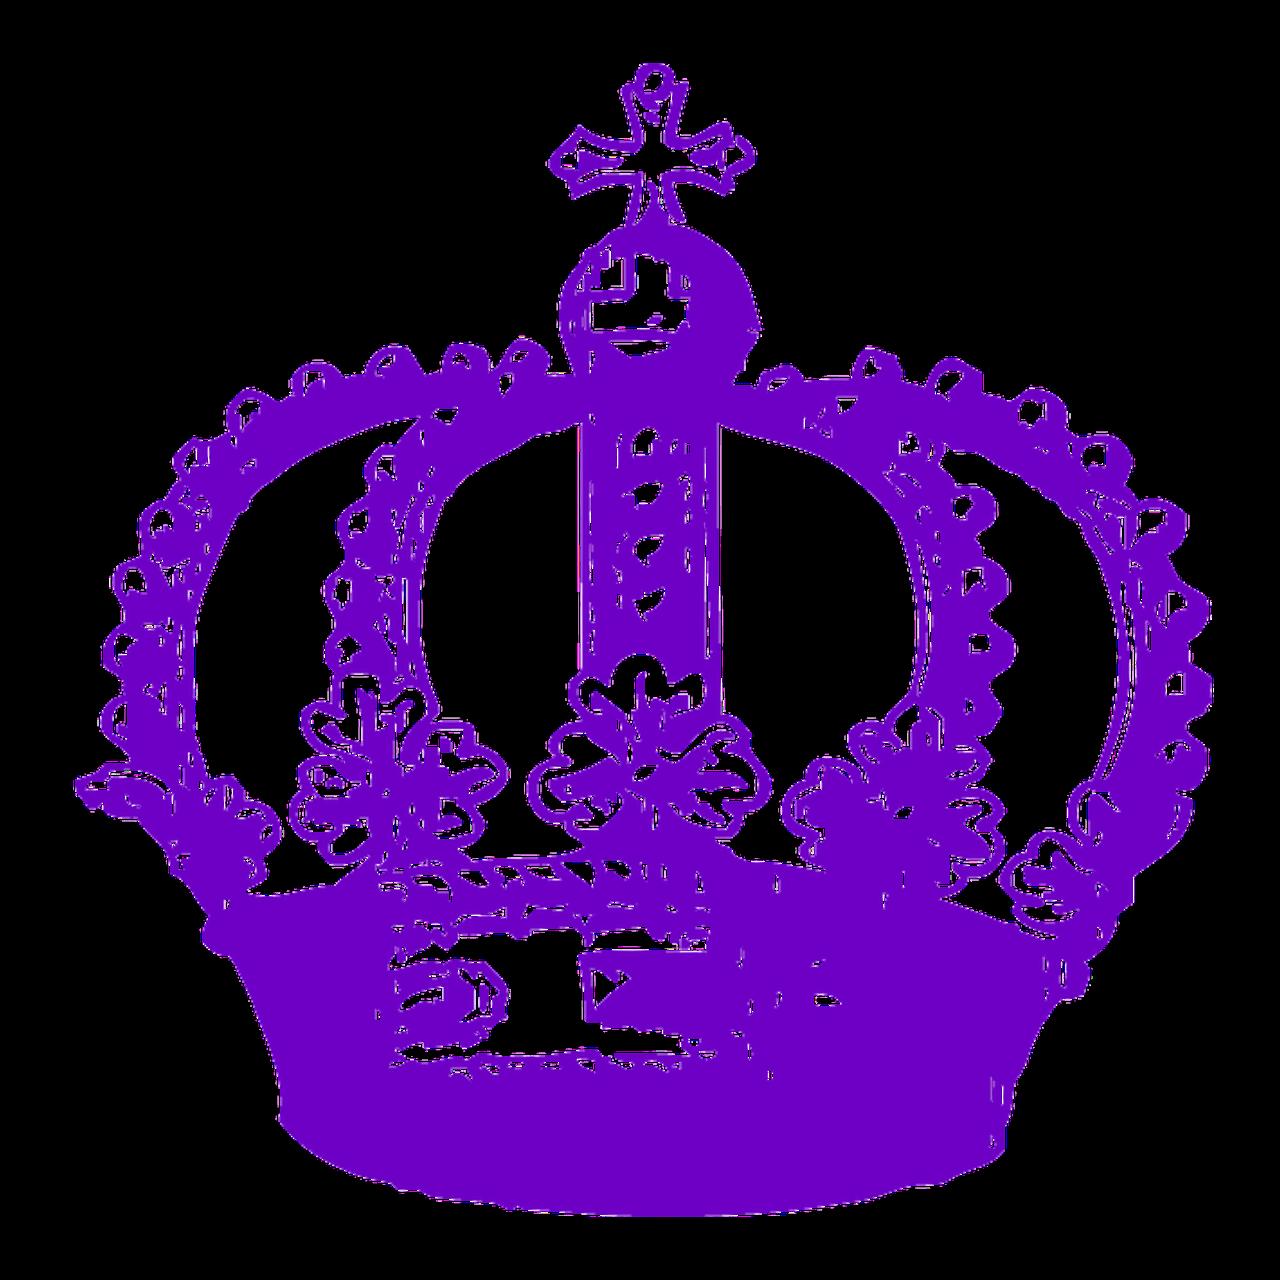 Crown royal vanilla clipart image freeuse download Crown Royal Purple Luxury King transparent image | Crown | Pinterest ... image freeuse download